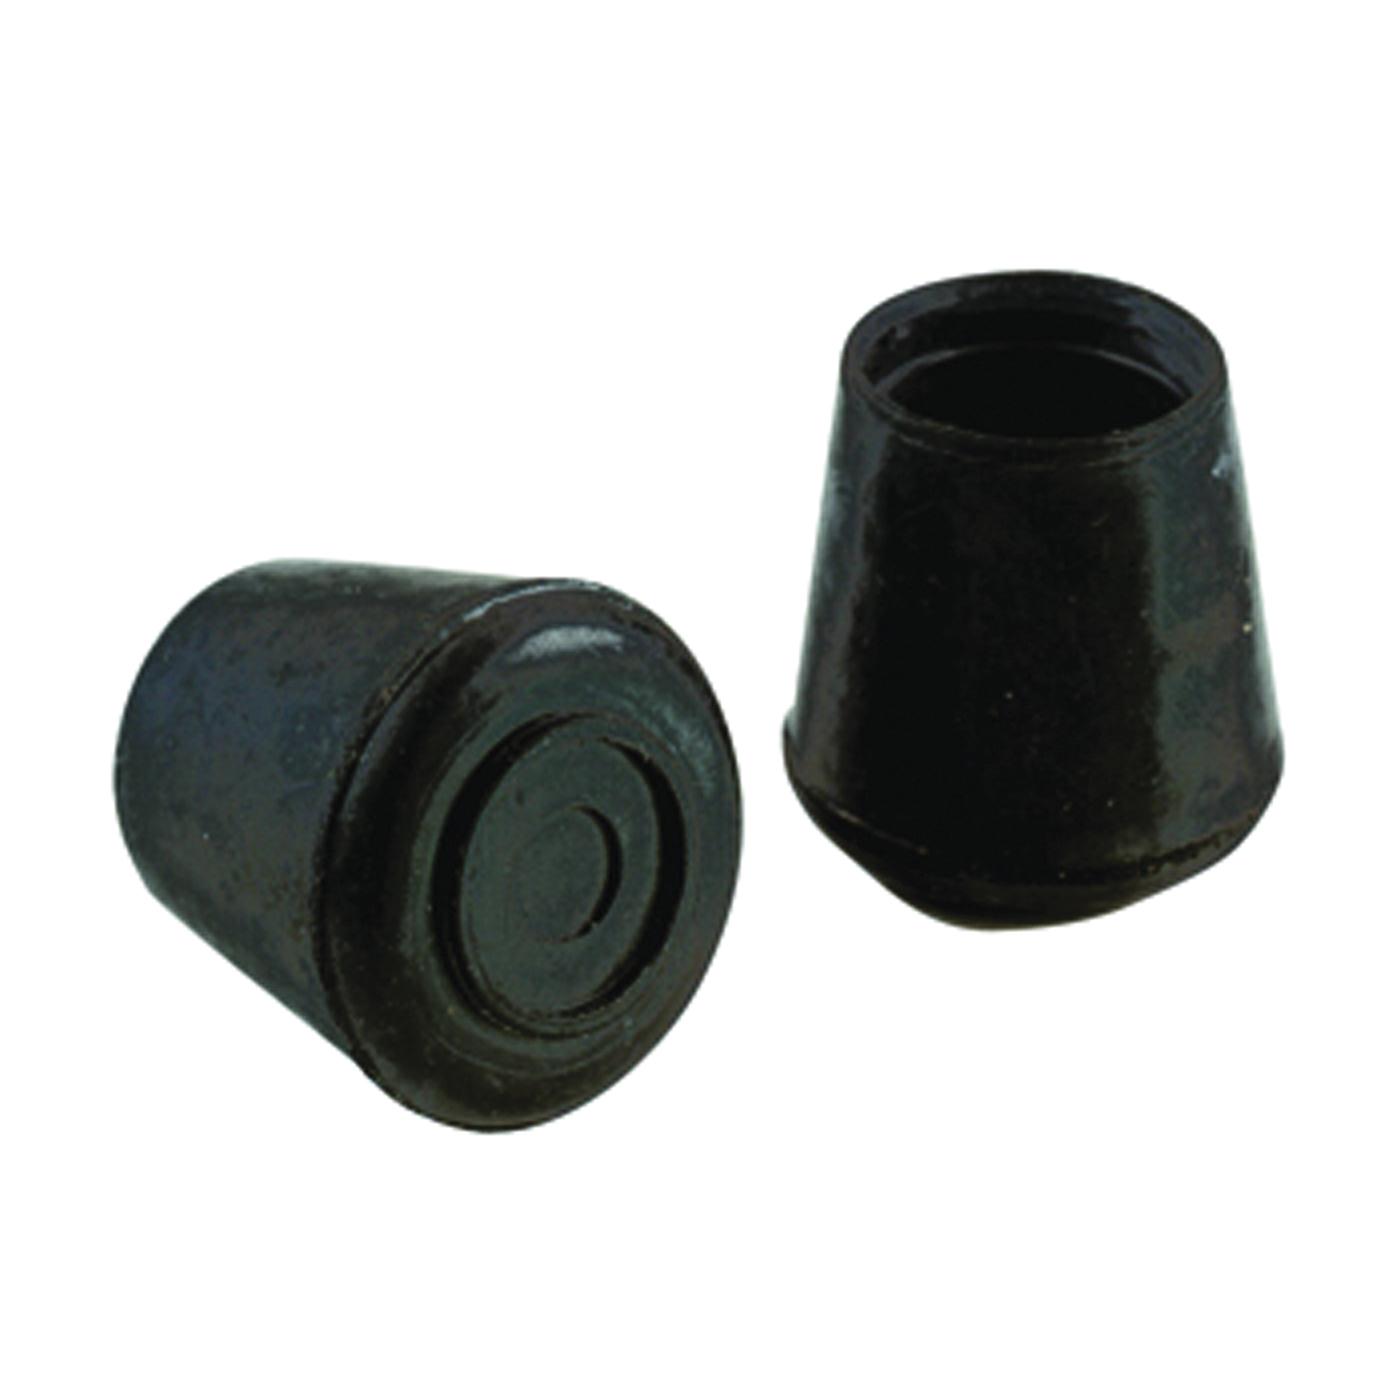 Picture of Shepherd Hardware 9128 Furniture Leg Tip, Round, Rubber, Black, 1 in Dia